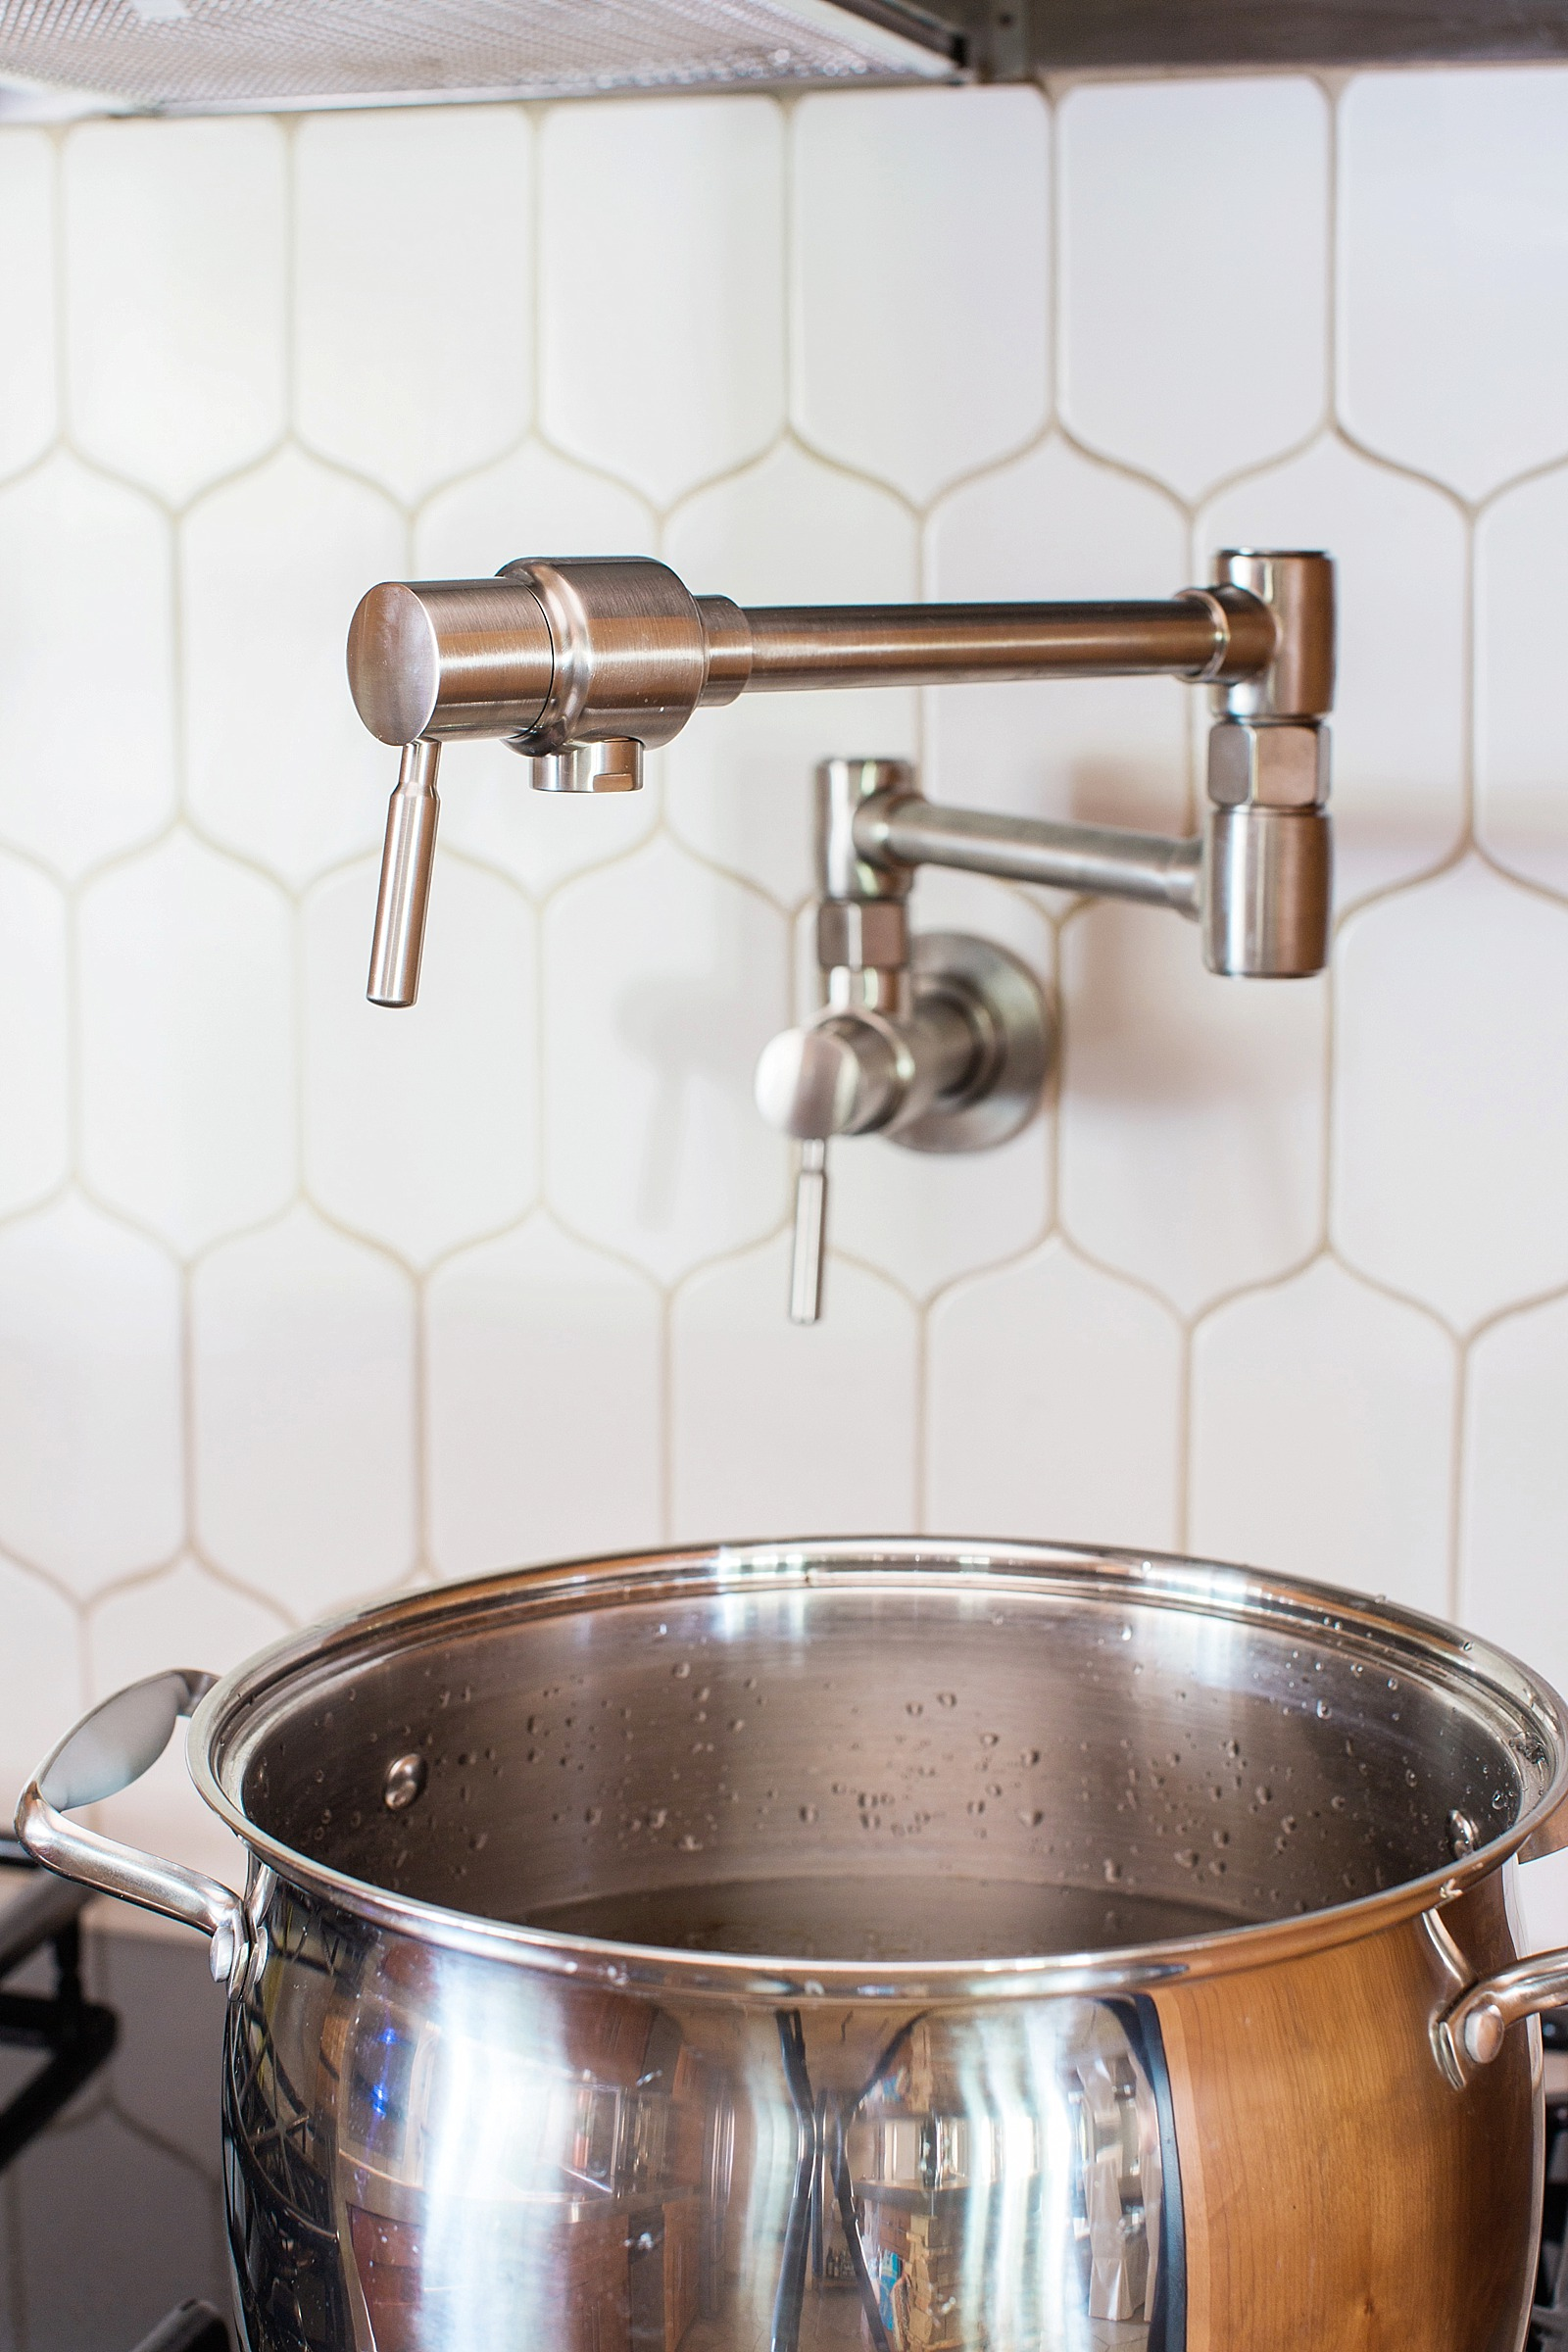 kitchen-diana-elizabeth-photography-blog-build-dot-com-brizo-pot-filler-above-stove-height-install-walker-zanger-cocoon-6th-avenue-mosaic-tile-white-tile-backsplash-9658